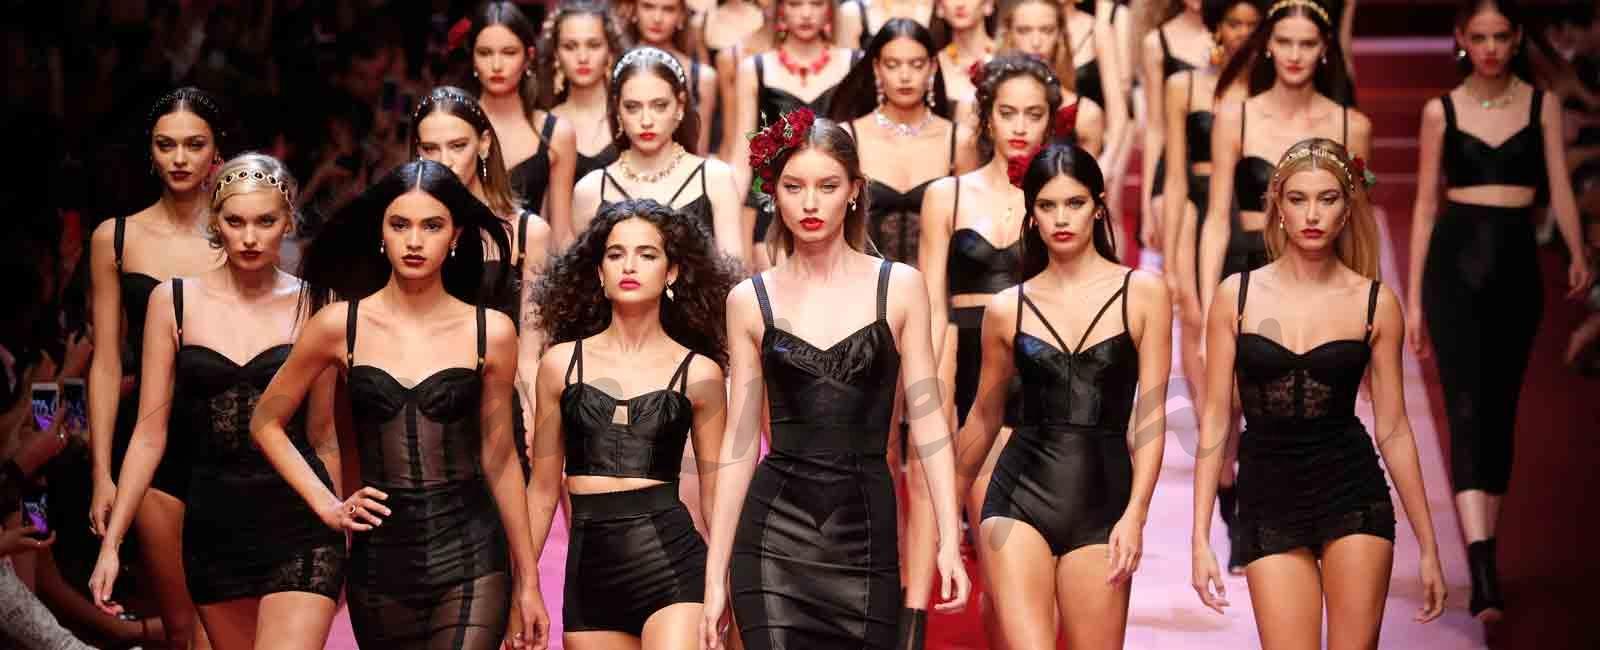 Milán Fashion Week: Doce & Gabbana Primavera Verano 2018